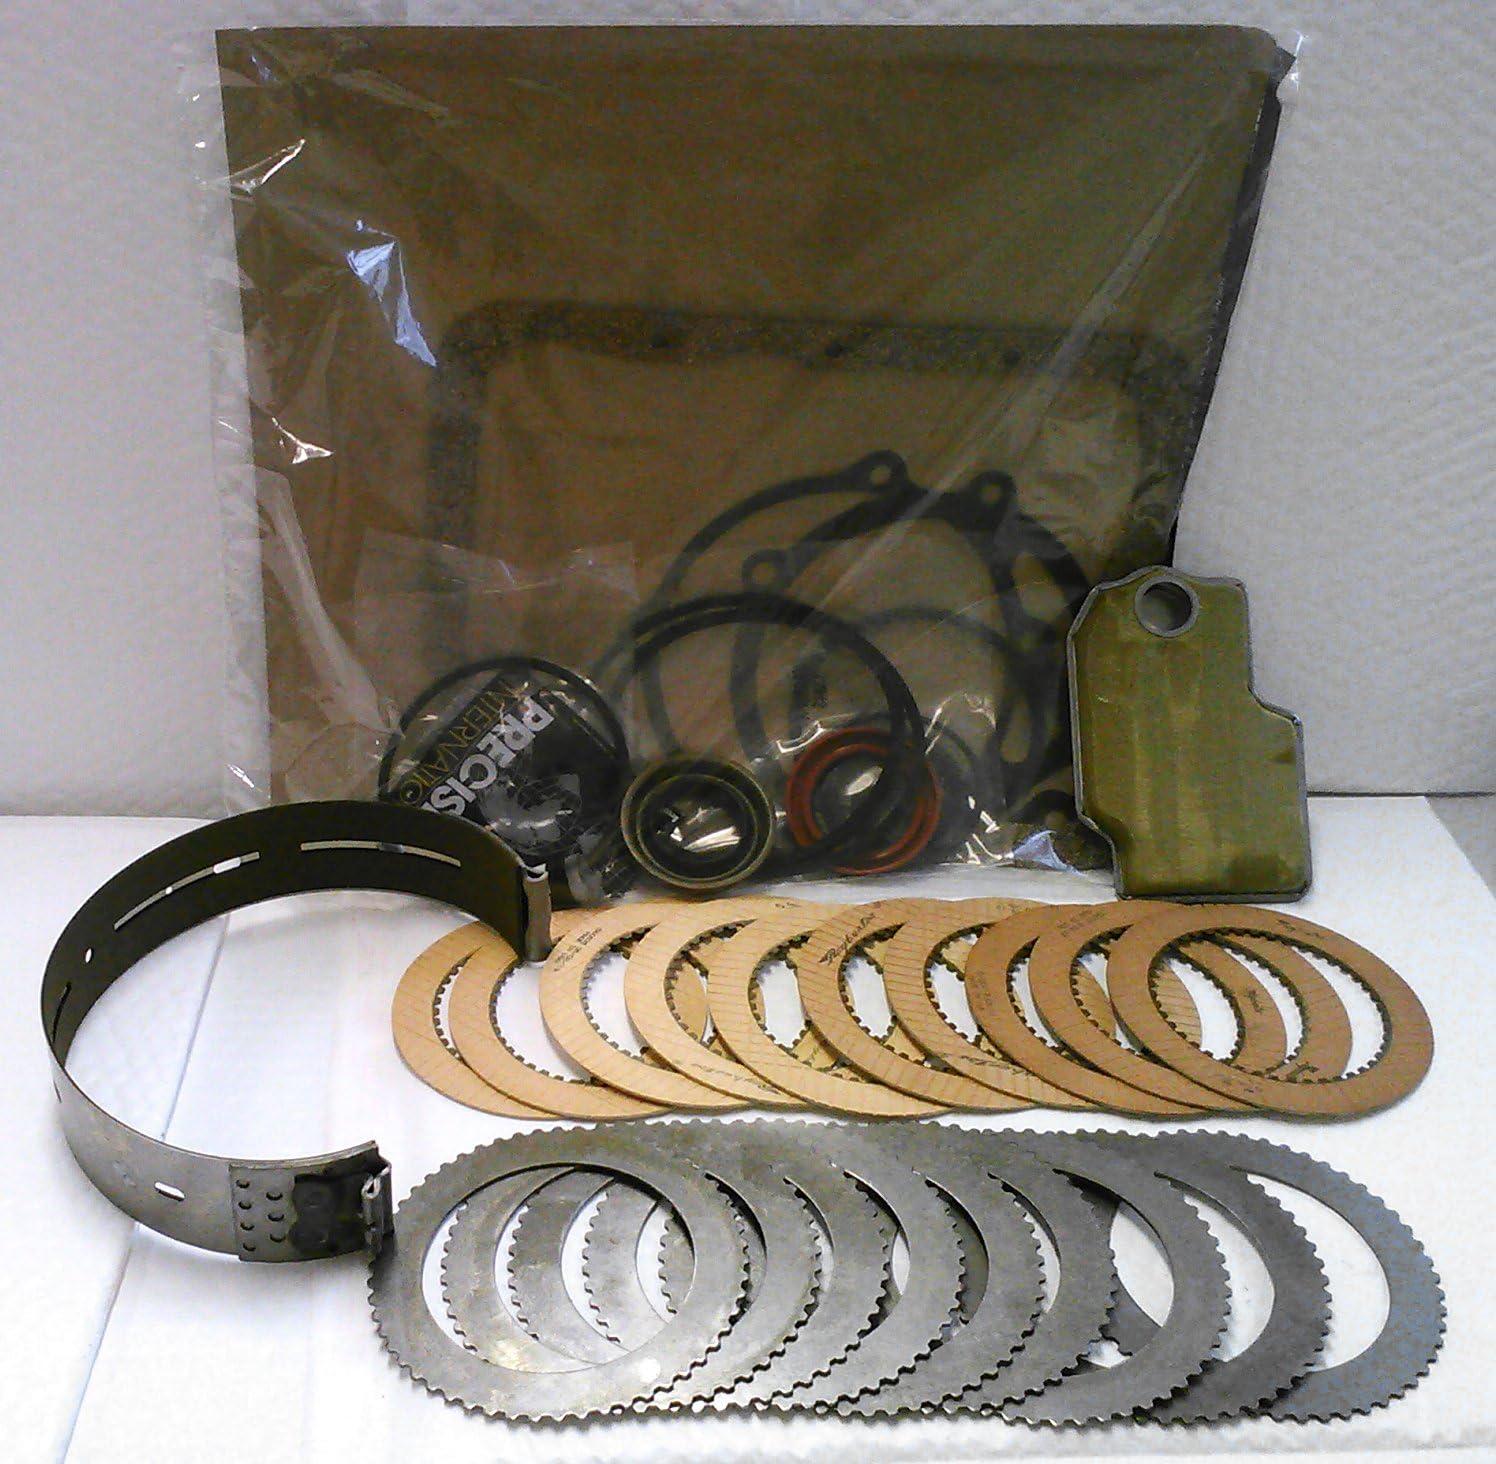 FMX Transmission Gasket and Seal Rebuild Kit 1968-1981 fits Ford